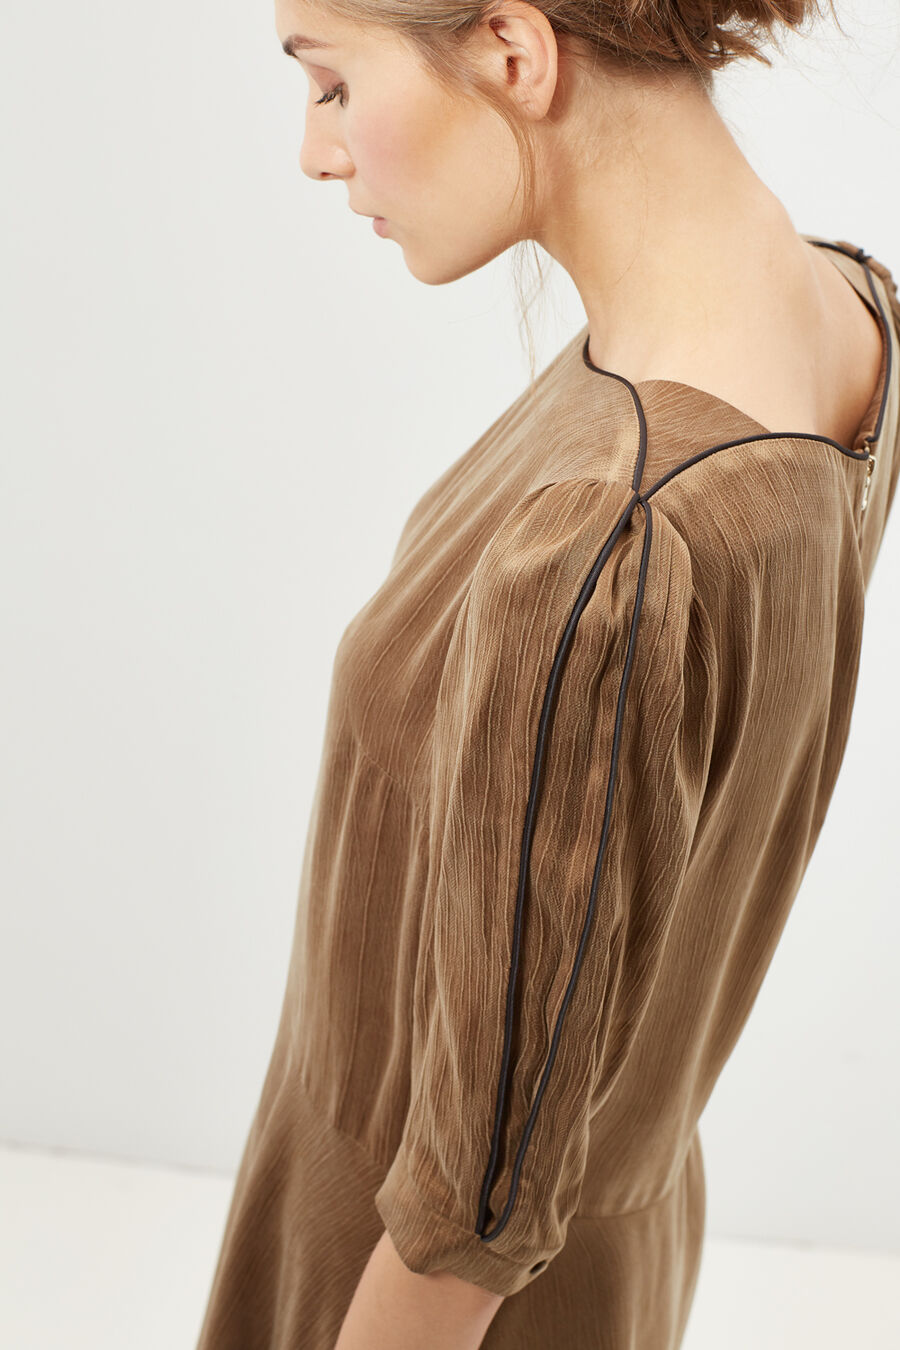 Boat-neck dress